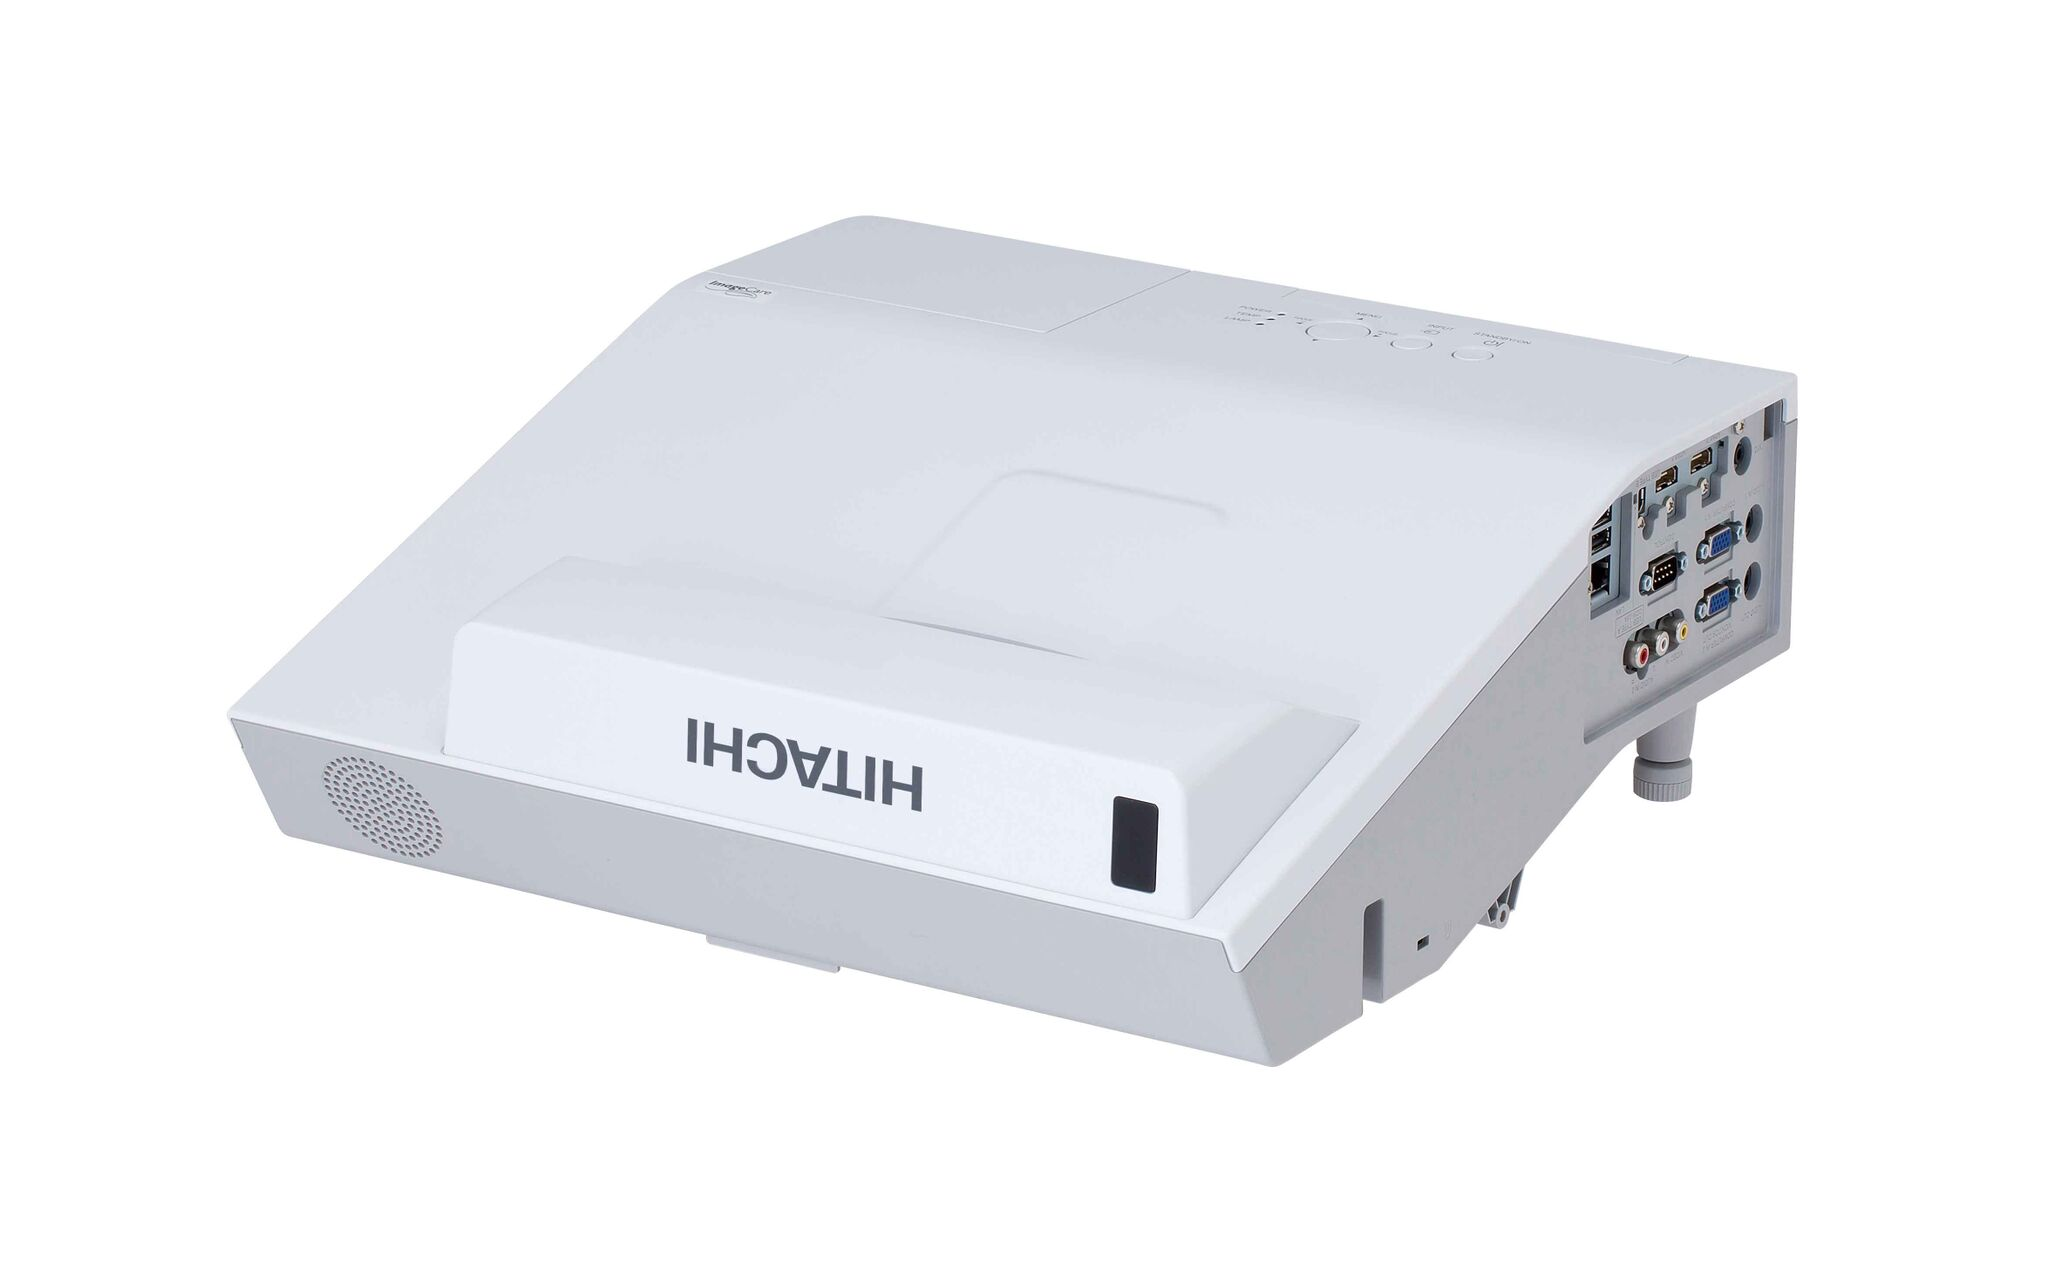 Maxell MC-AW3506 3700lm WXGA Ultra Short Throw LCD Projector